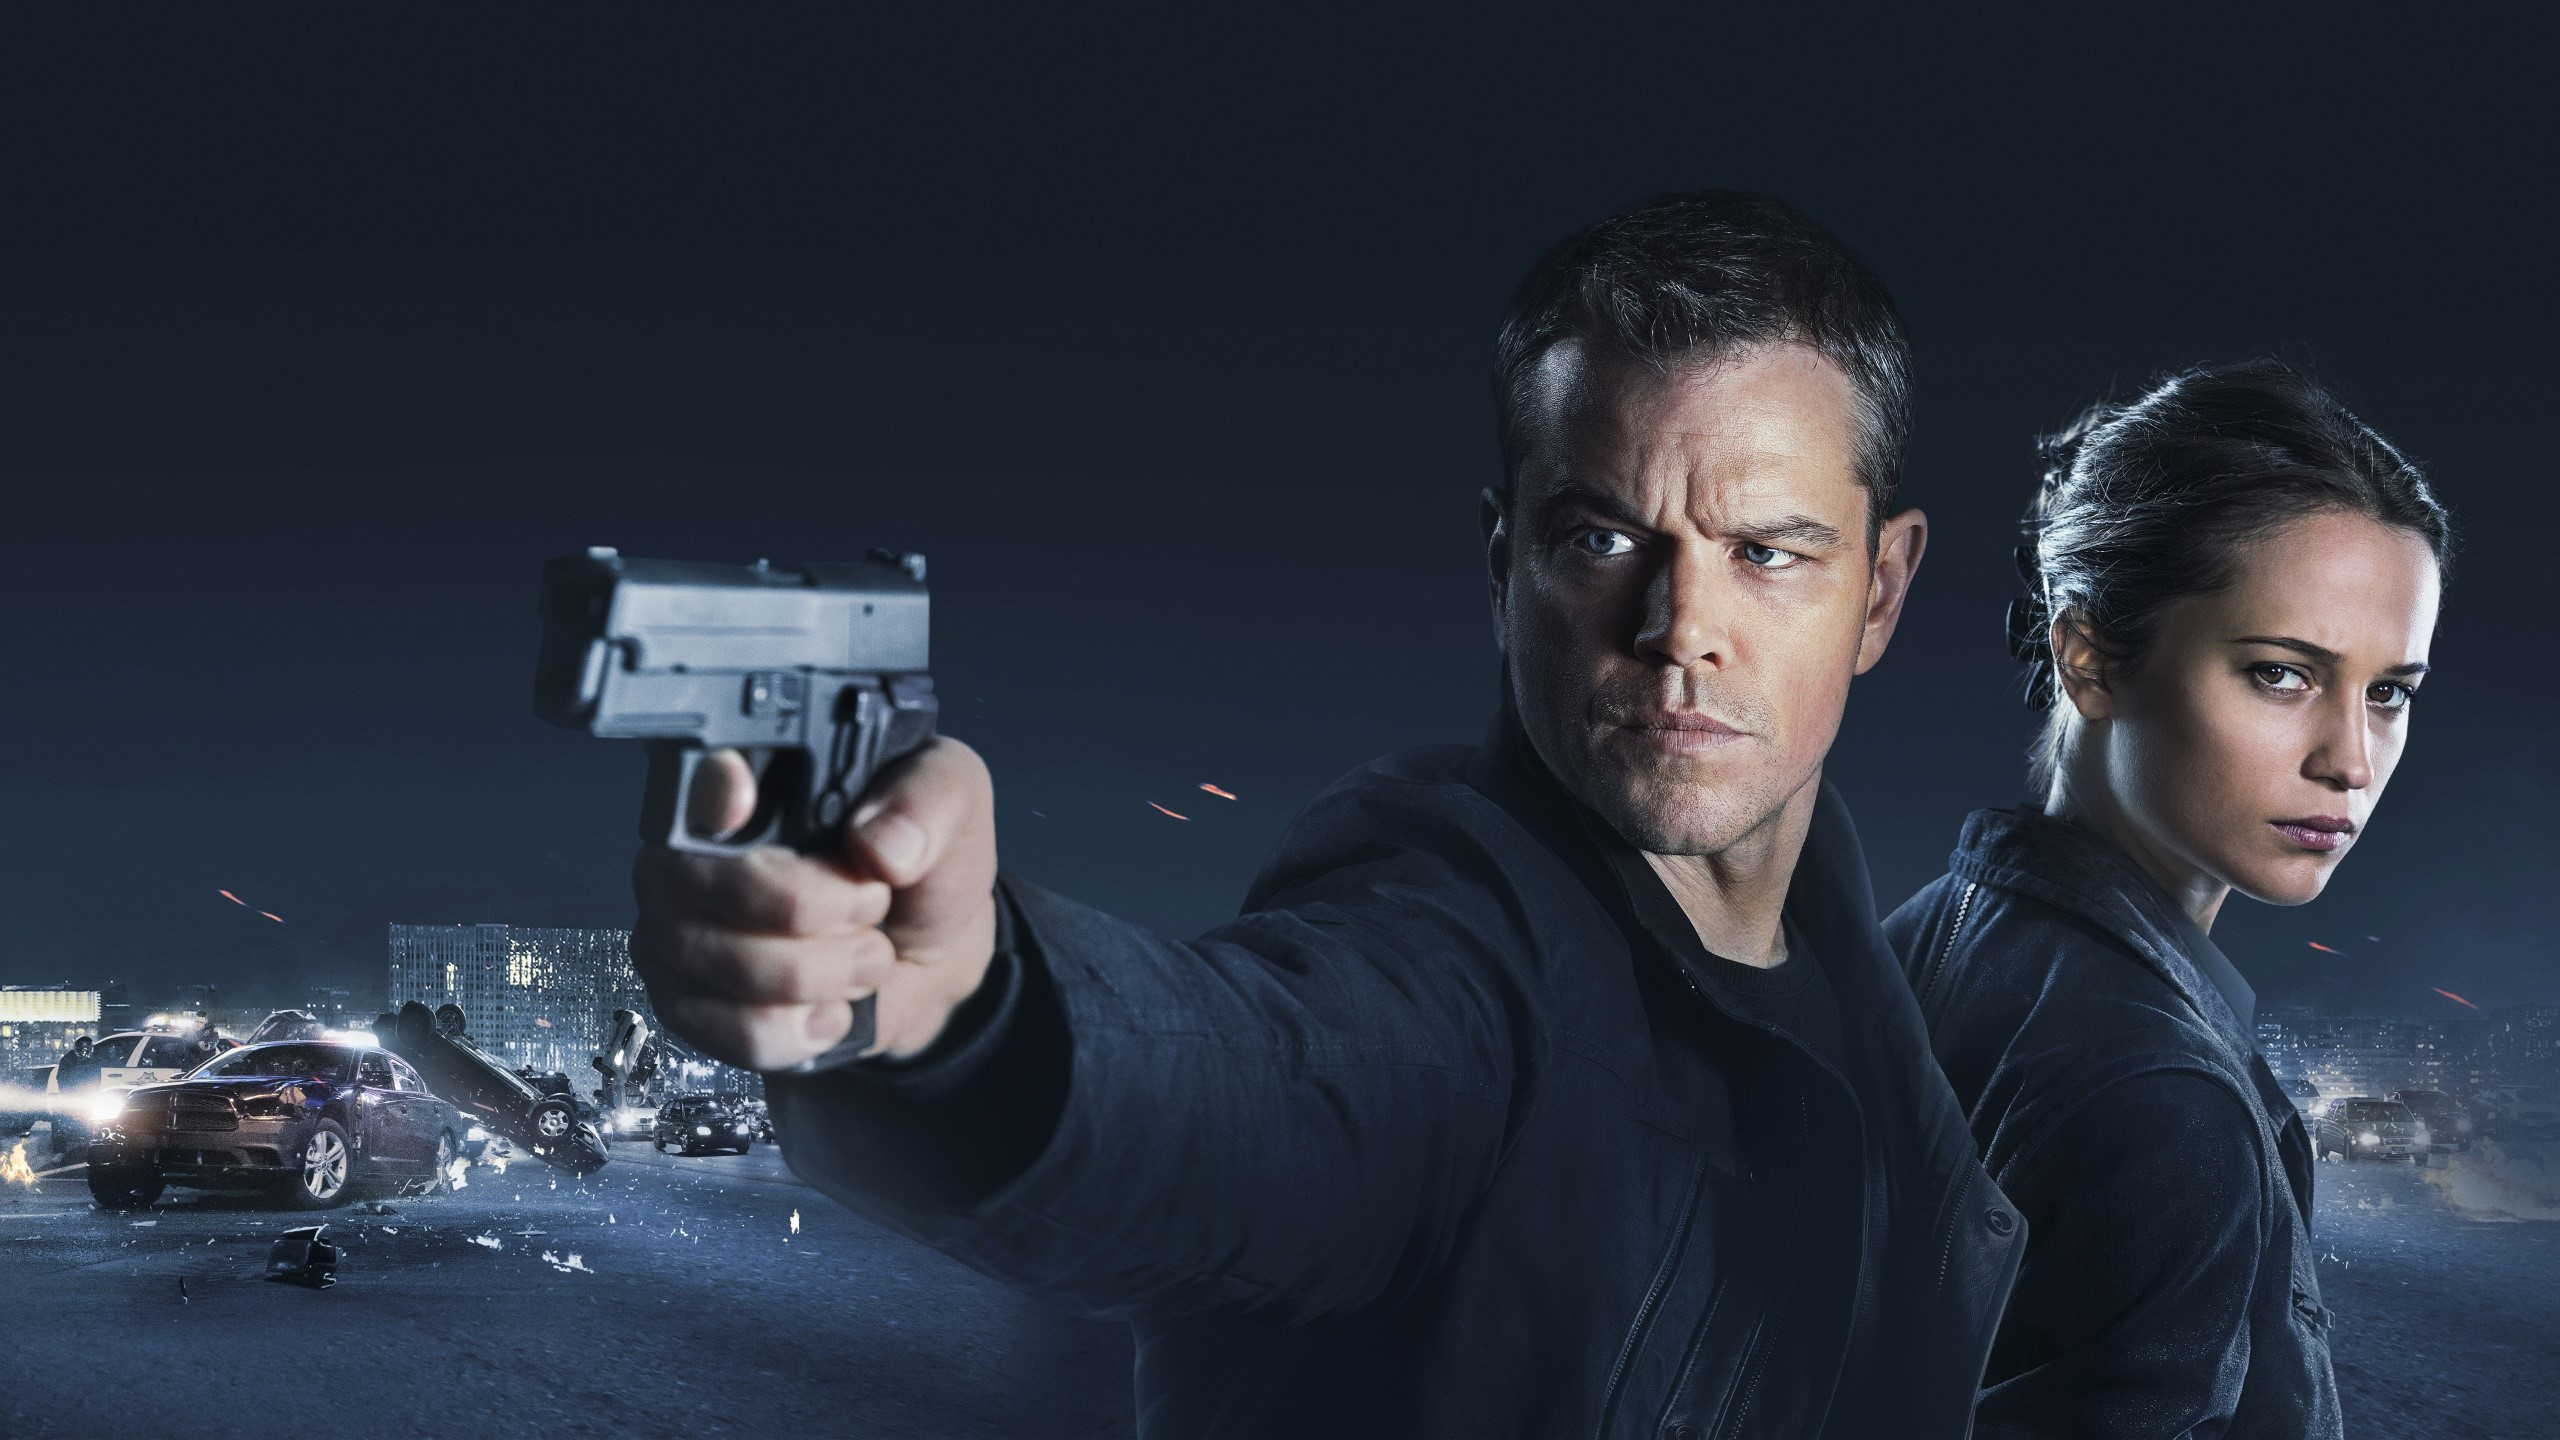 Wallpaper Jason Bourne Movie